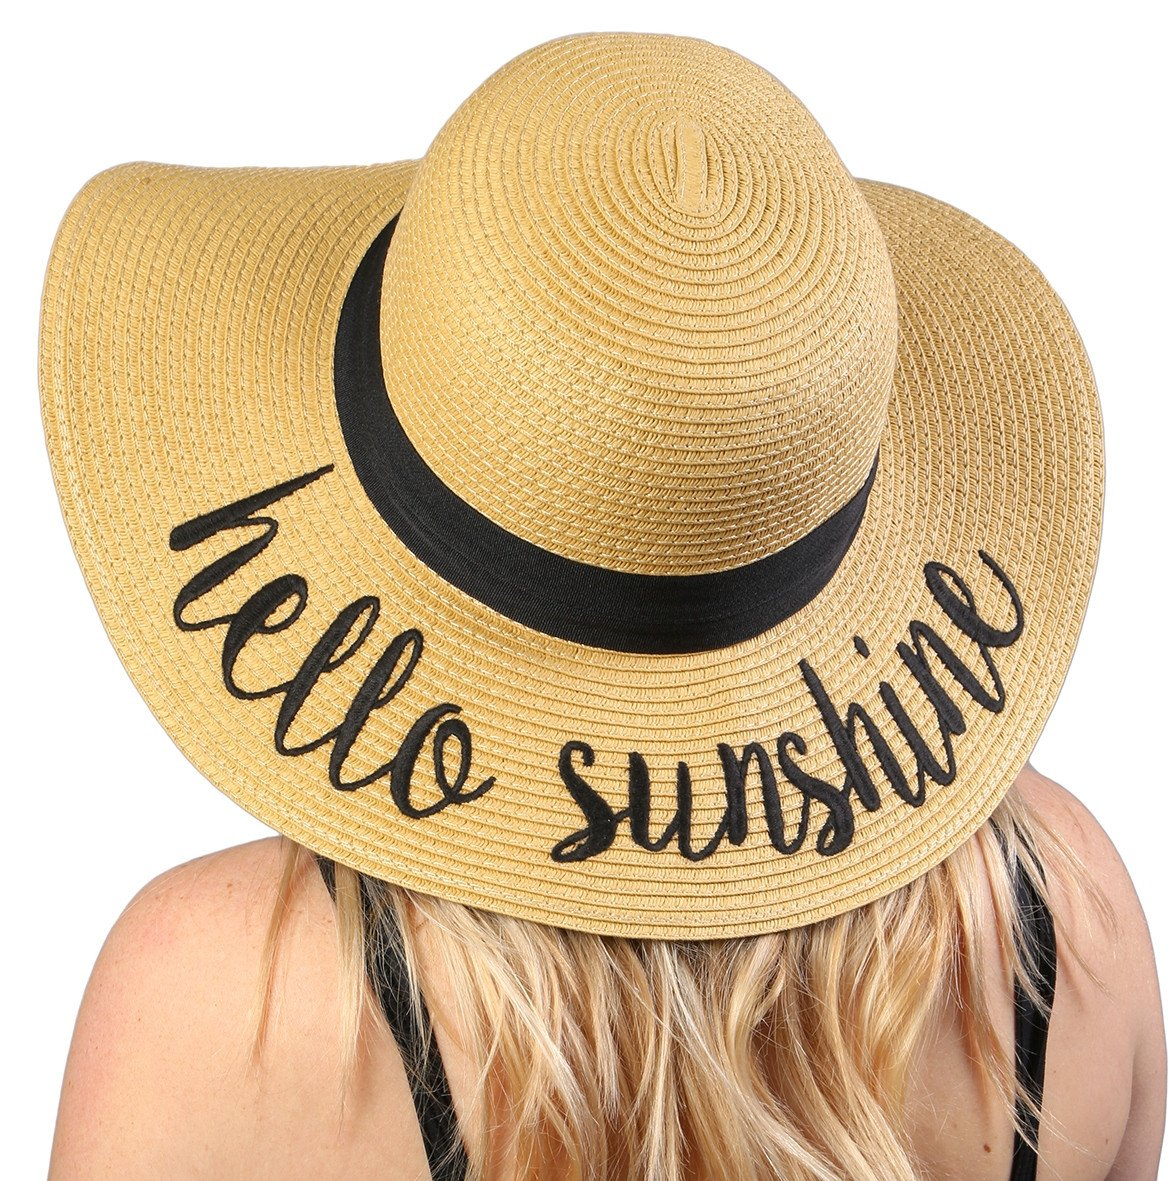 1c6cdb2577b75 Funky Junque s Women s Bold Cursive Embroidered Adjustable Beach Floppy Sun  Hat - Hello Sunshine